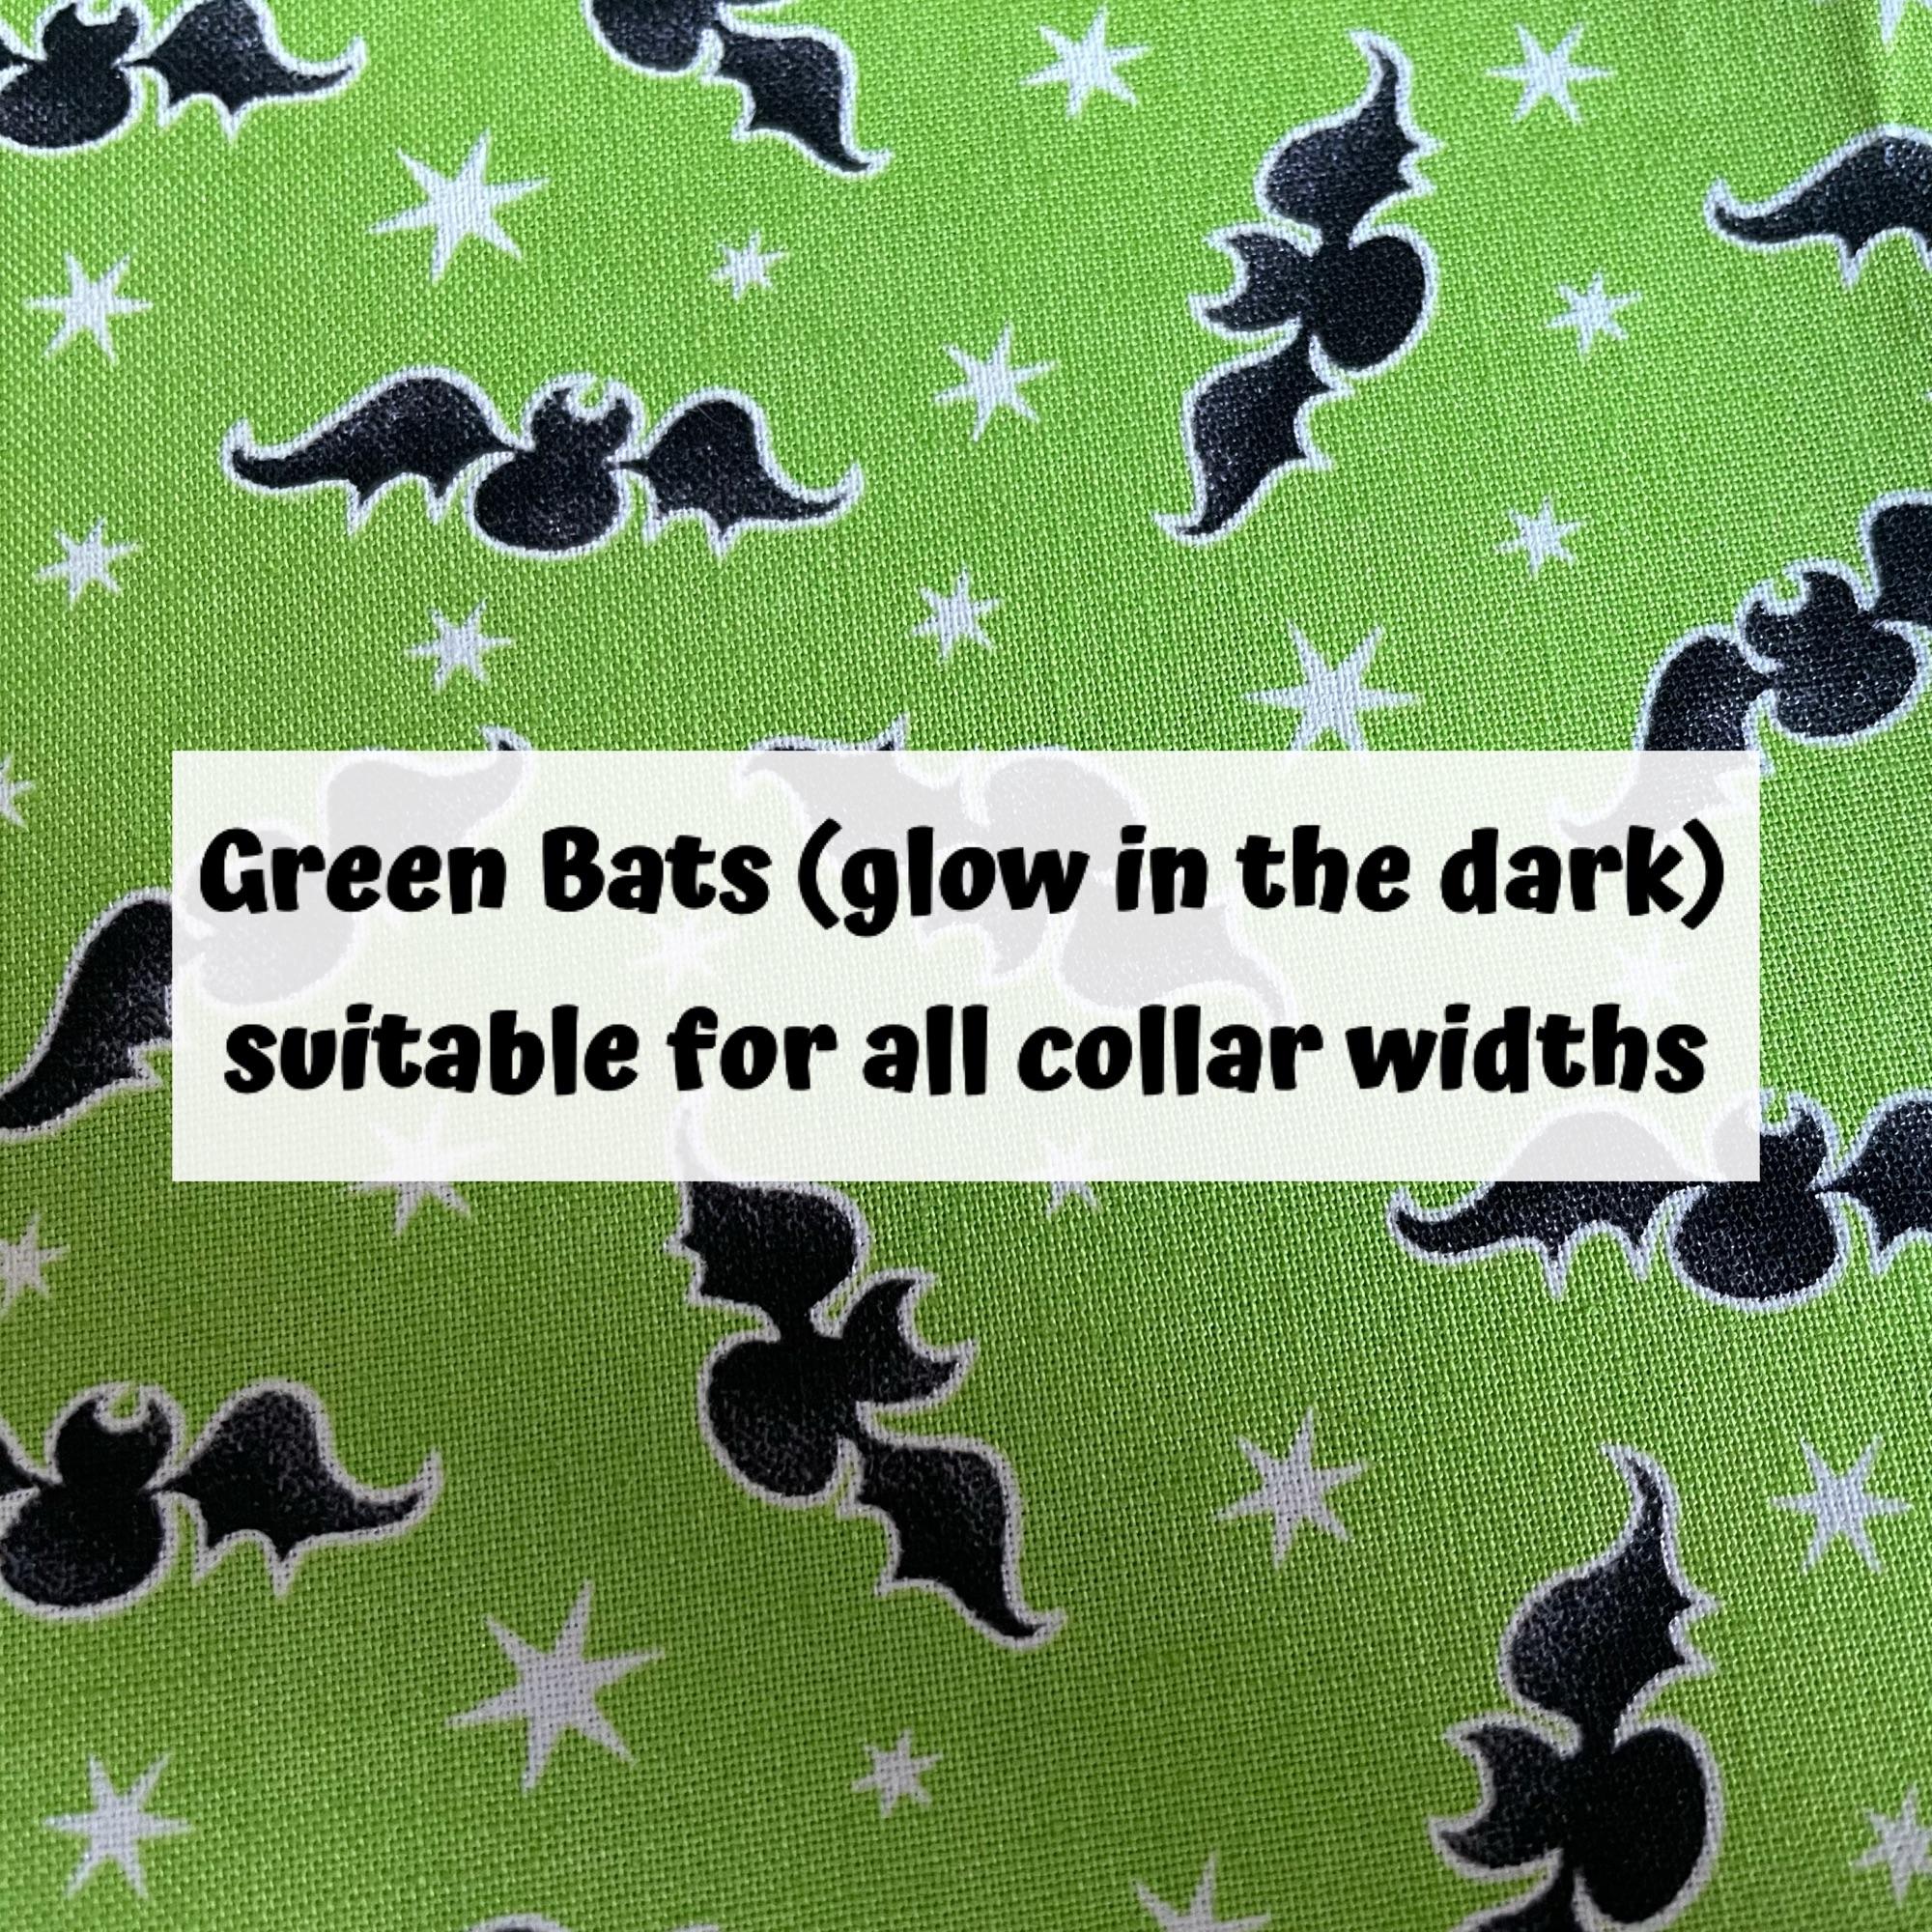 Green Bats (glow in the dark)